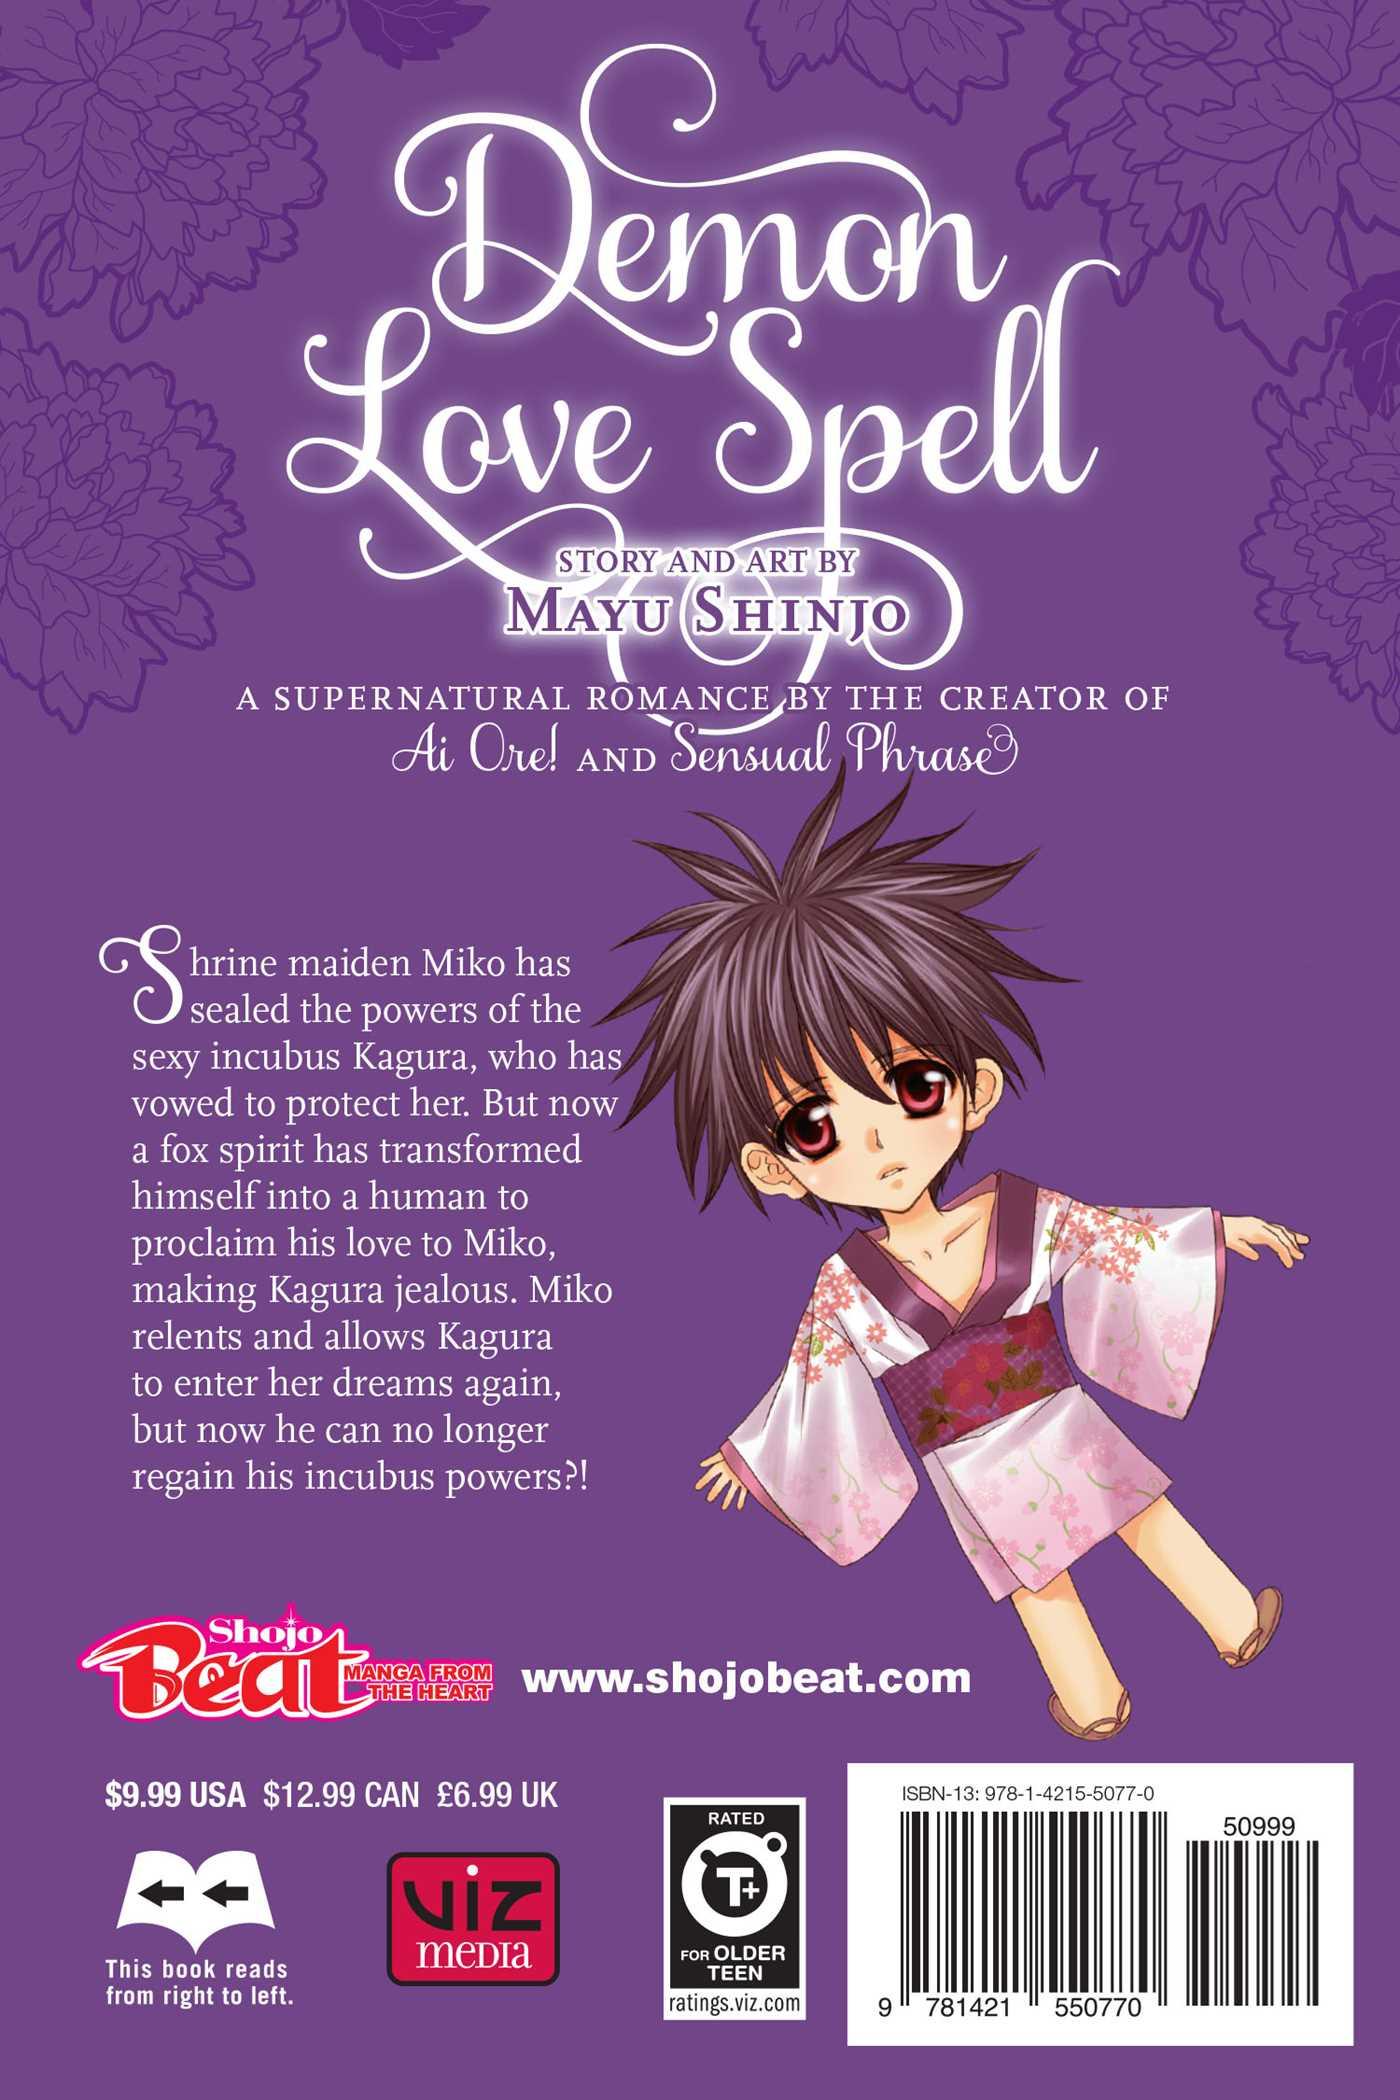 Demon Love Spell, Vol  2 | Book by Mayu Shinjo | Official